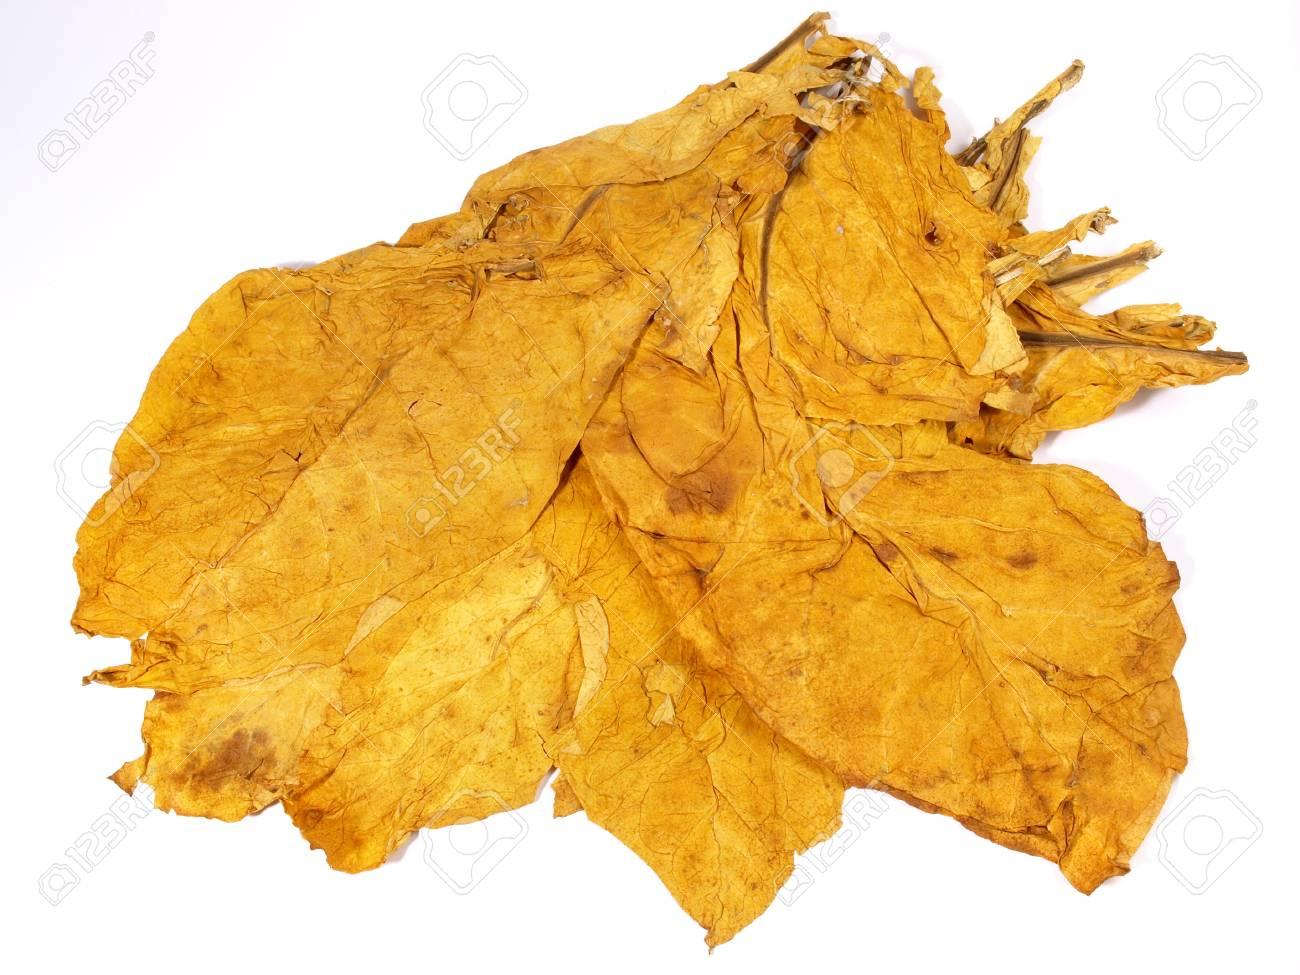 Dried Tobacco Leaves - 121777123